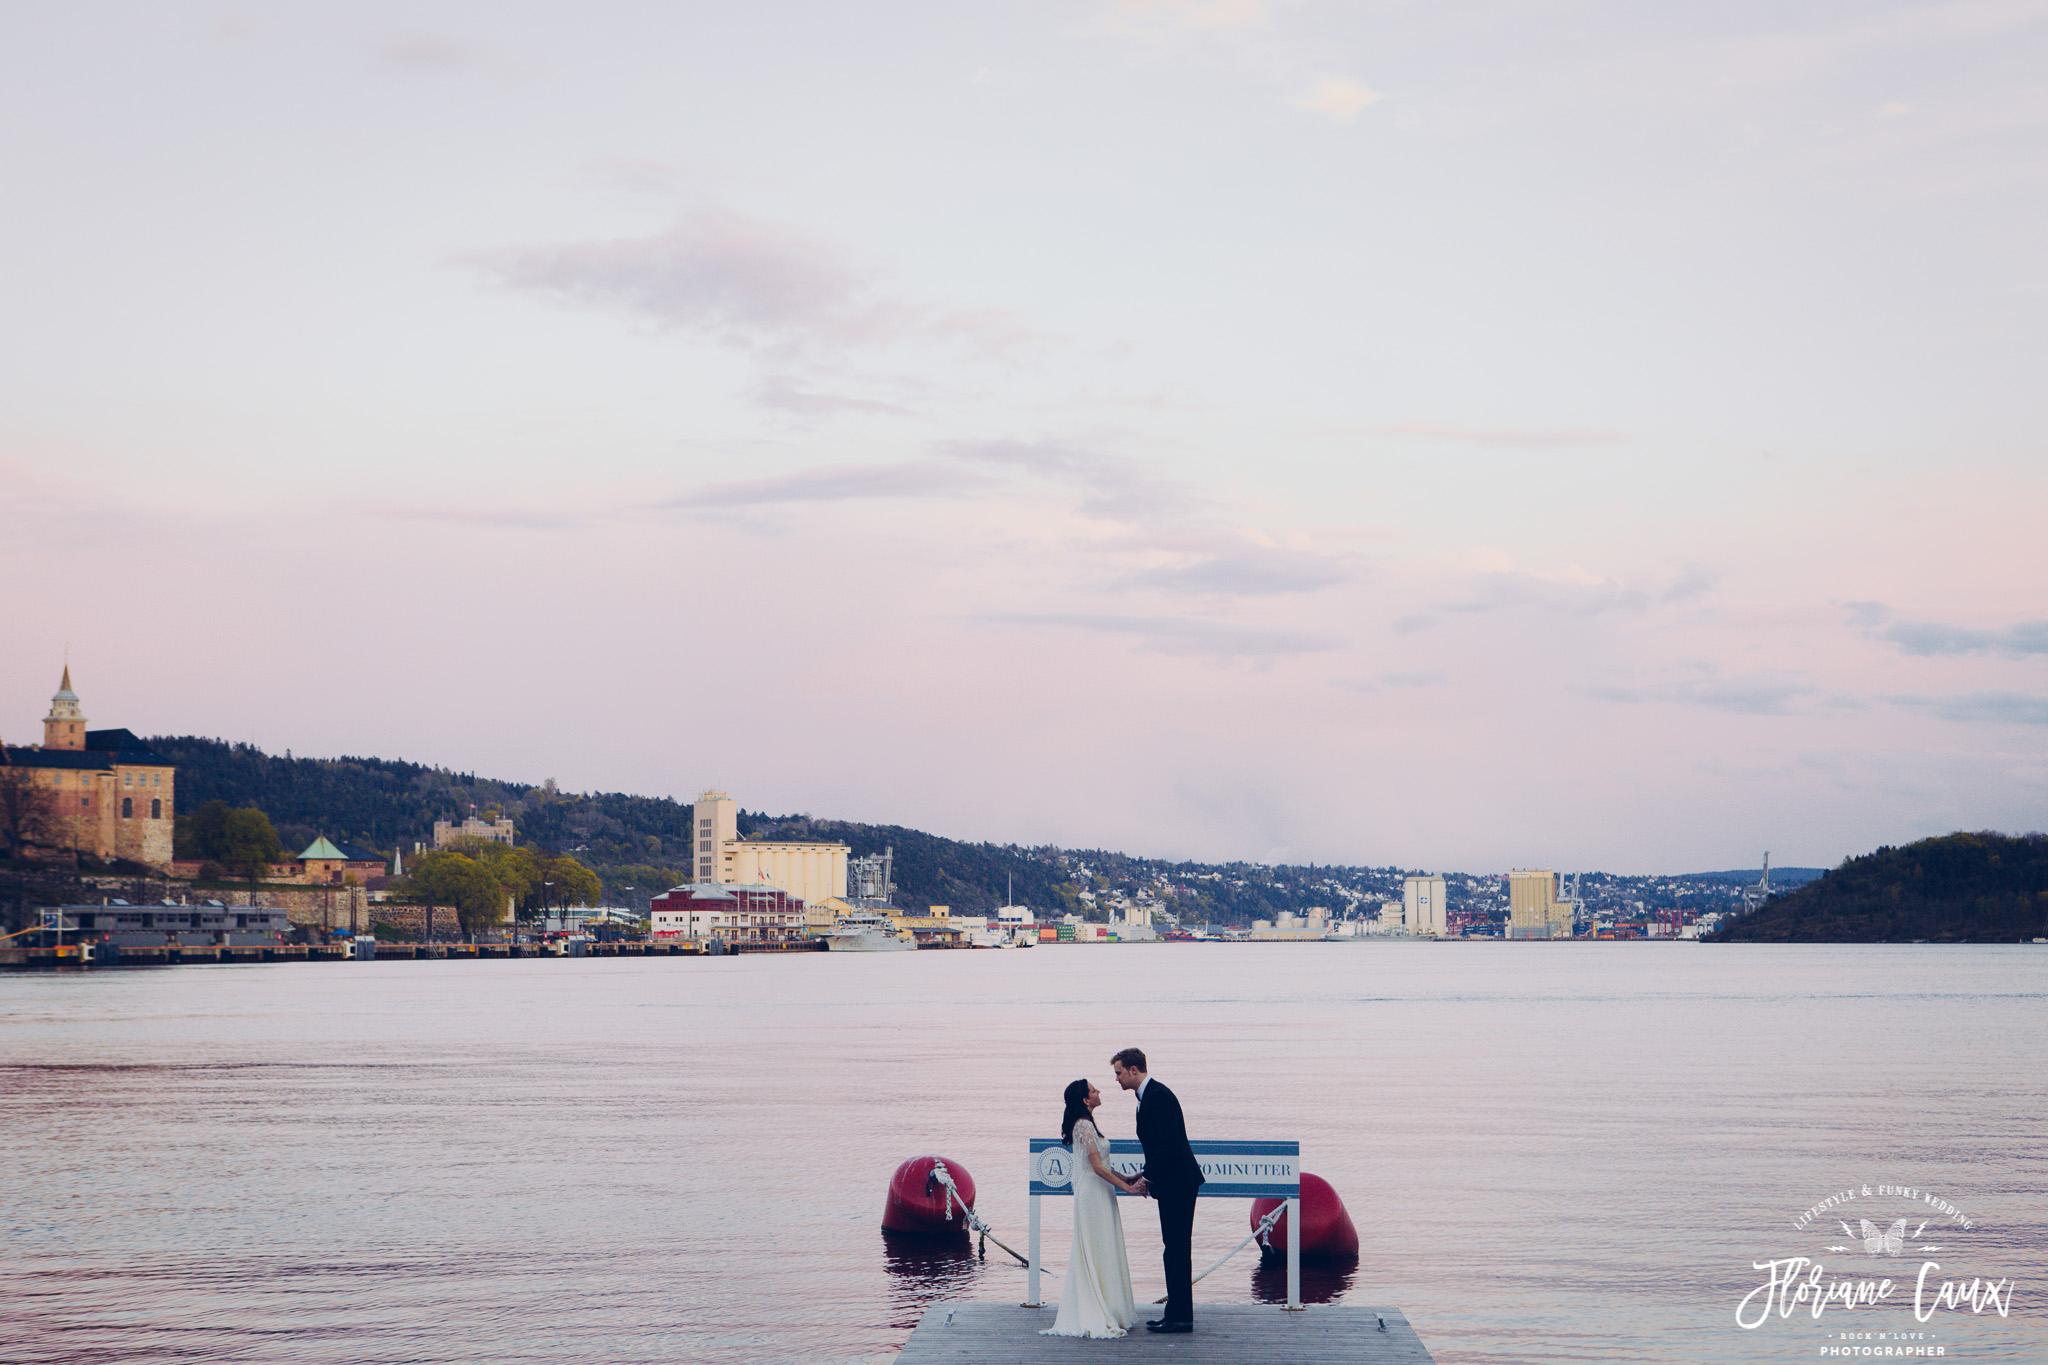 destination-wedding-photographer-oslo-norway-floriane-caux-50